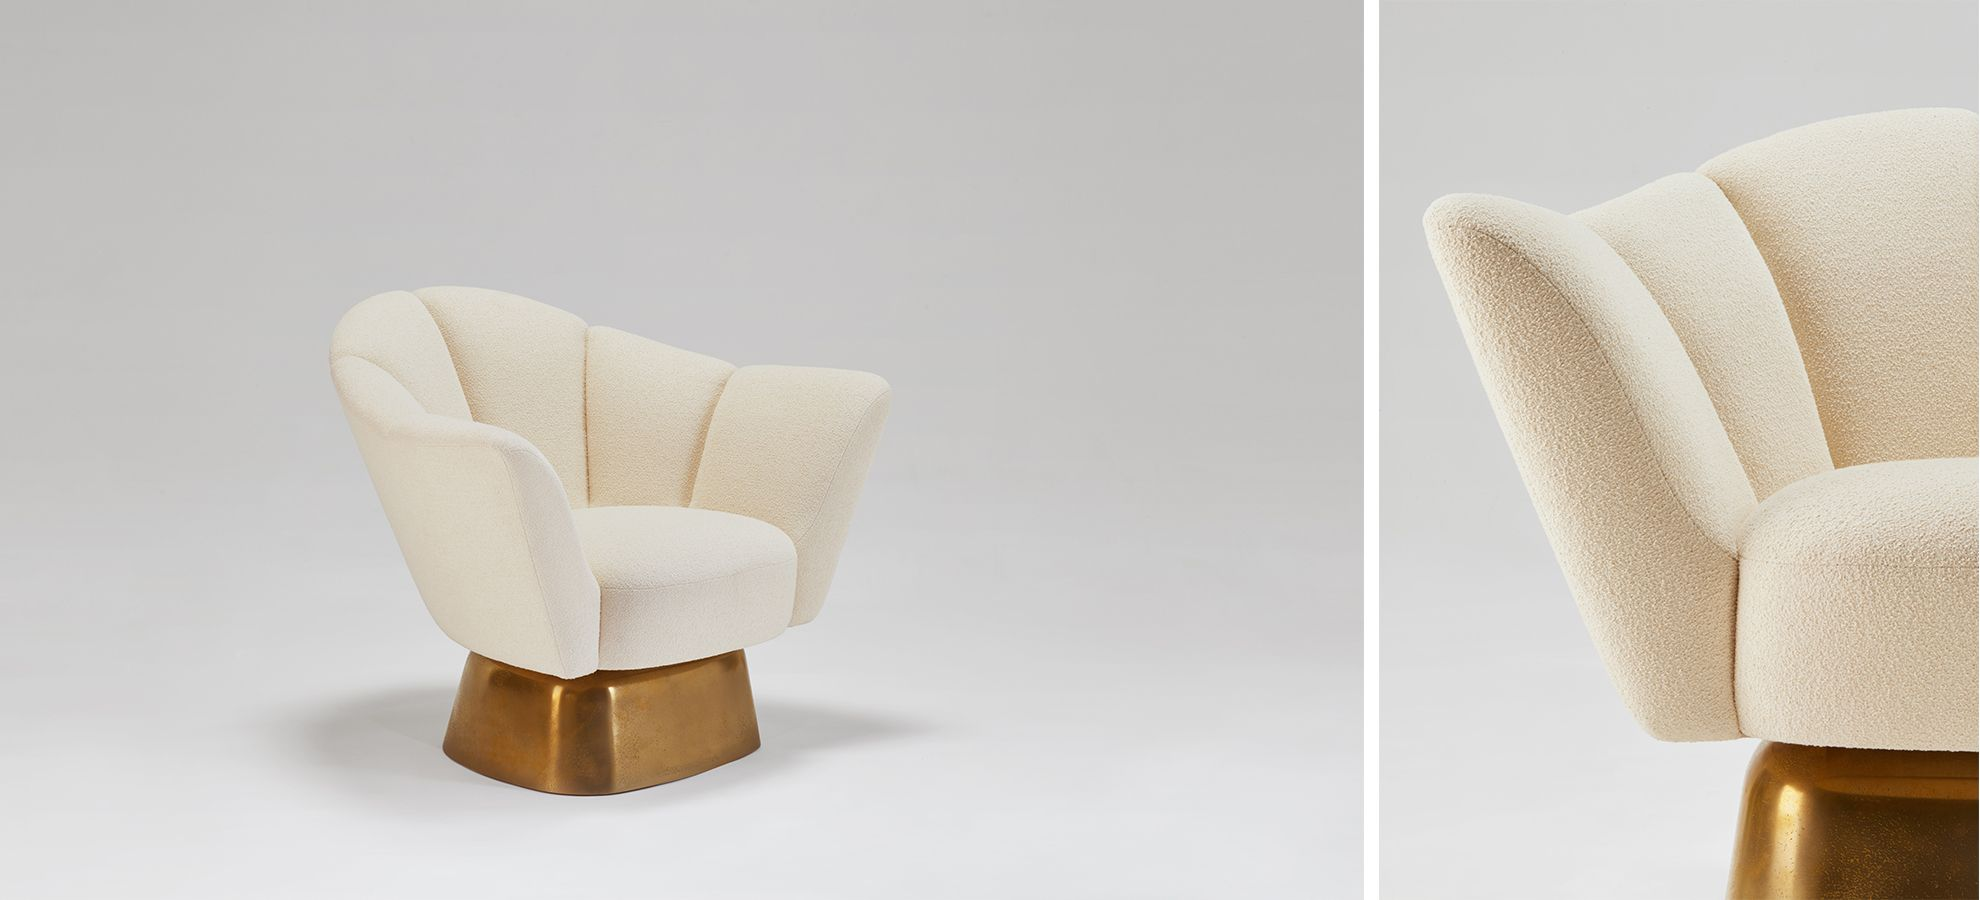 langlois furniture. Langlois Furniture G